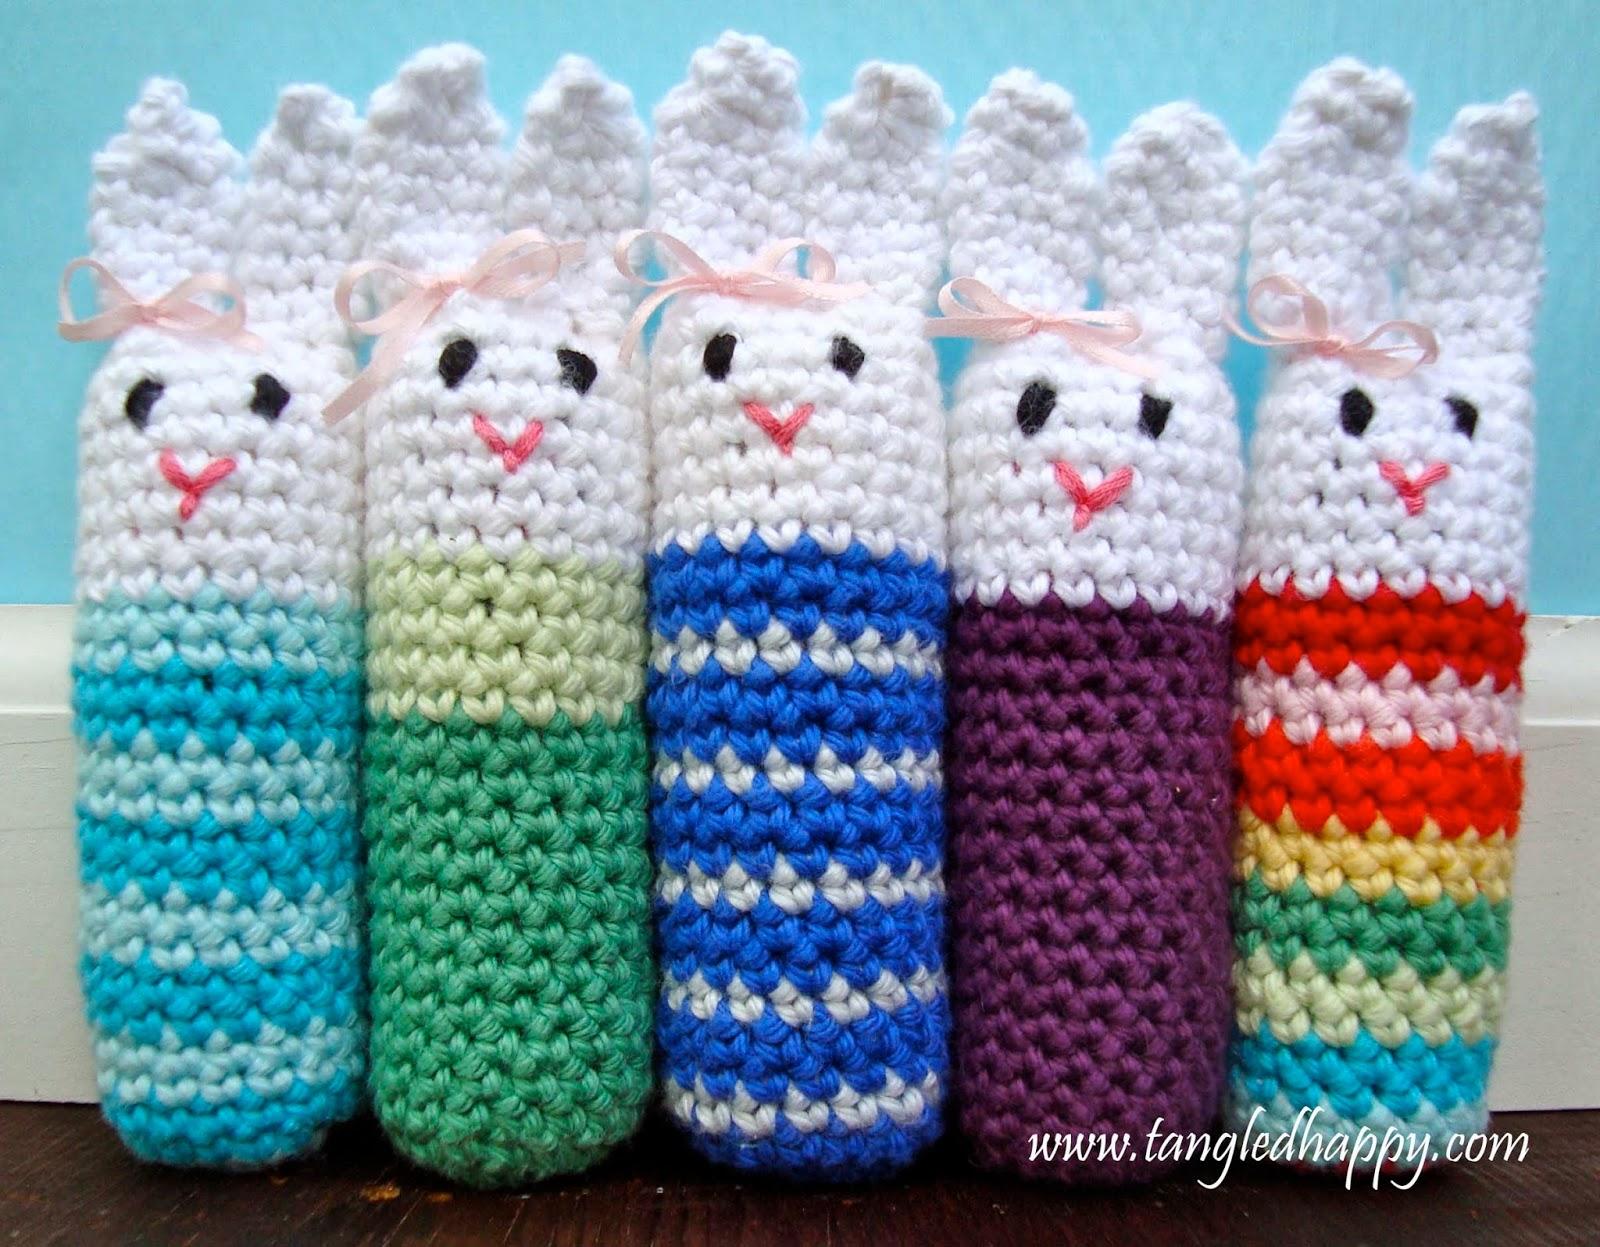 Amigurumi Easy : tangled happy: How To Crochet An Easy Amigurumi Bunny ...